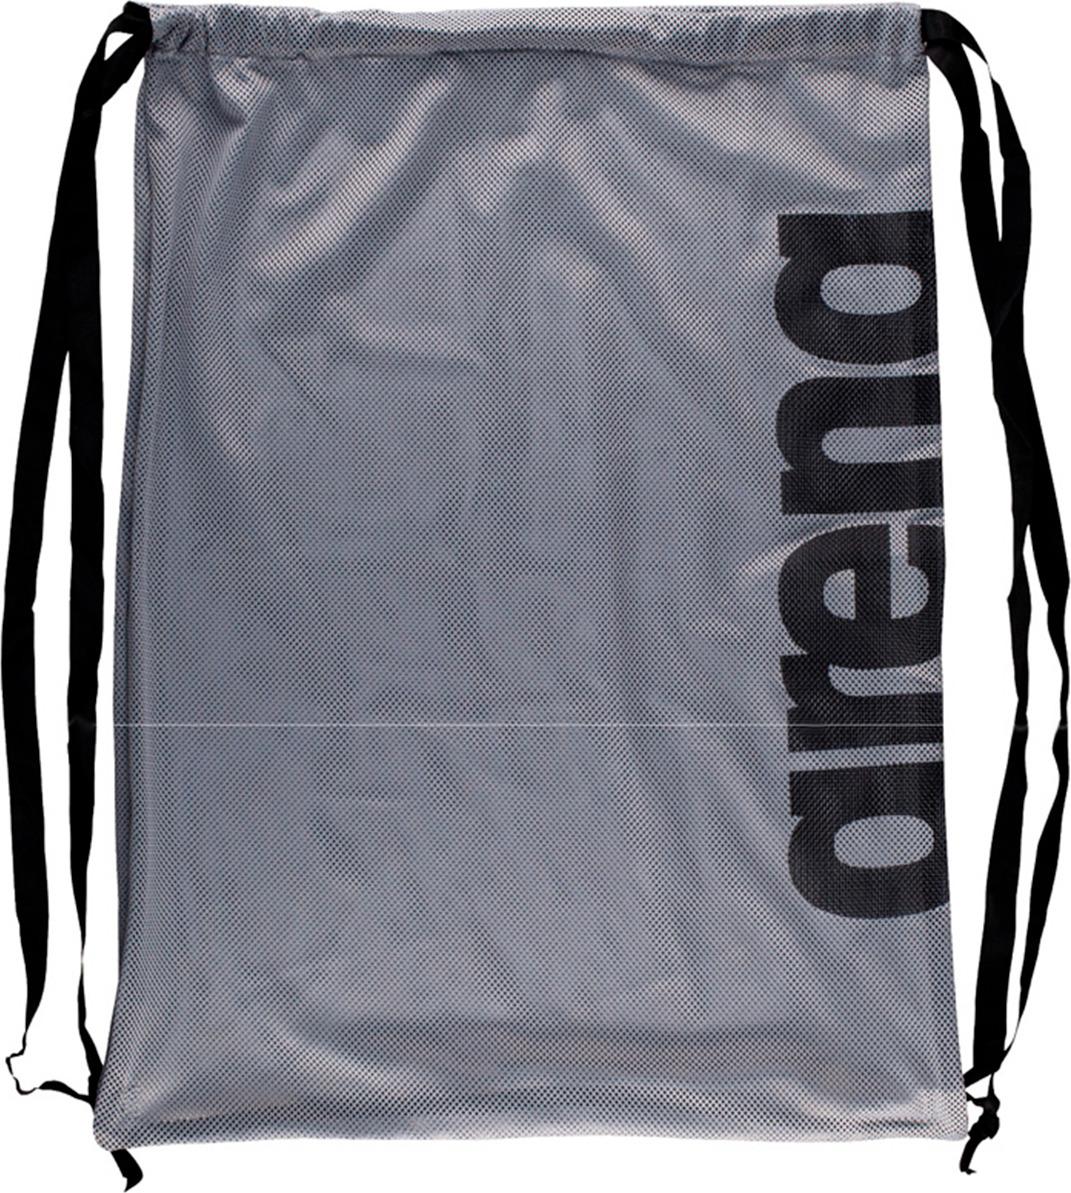 Сумка-мешок Arena, цвет:  серый, 65 х 45 см.  1E045 52 Arena